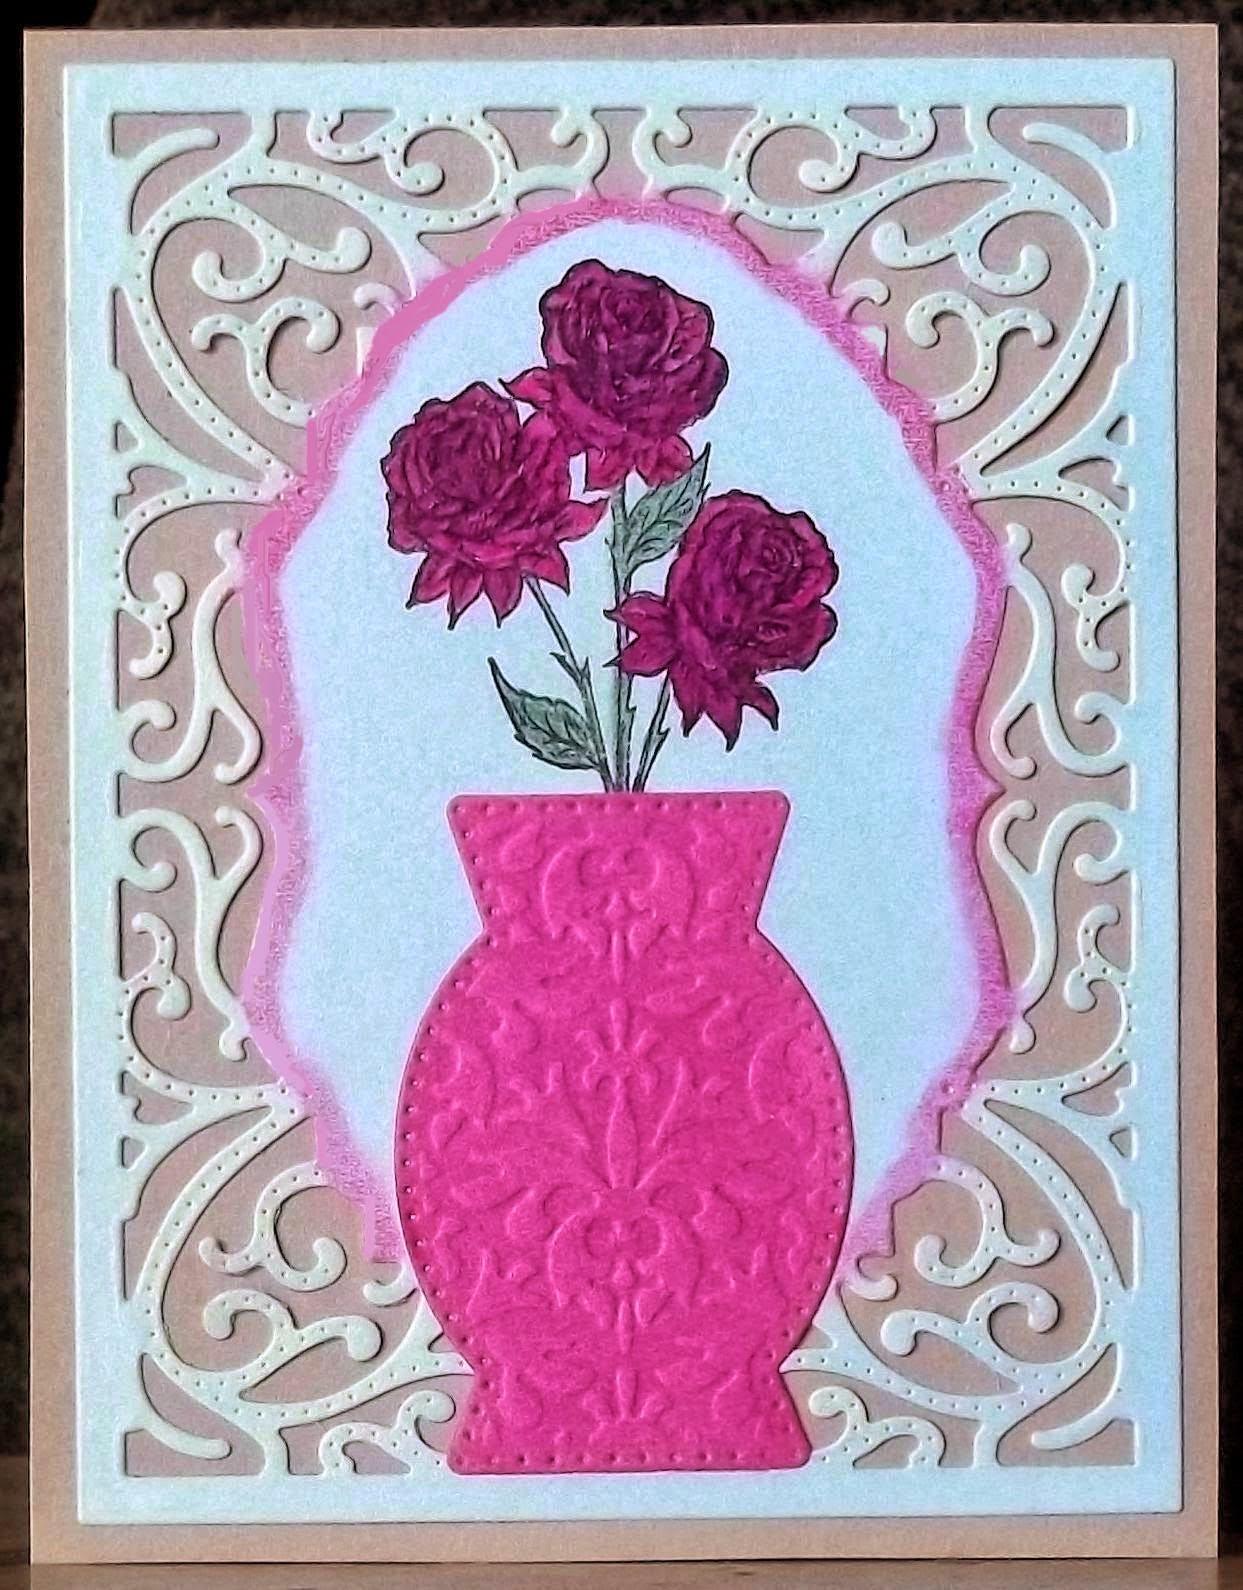 Our Daily Bread Designs, Rose, Decorative Vase, Vintage Flourish Pattern Die